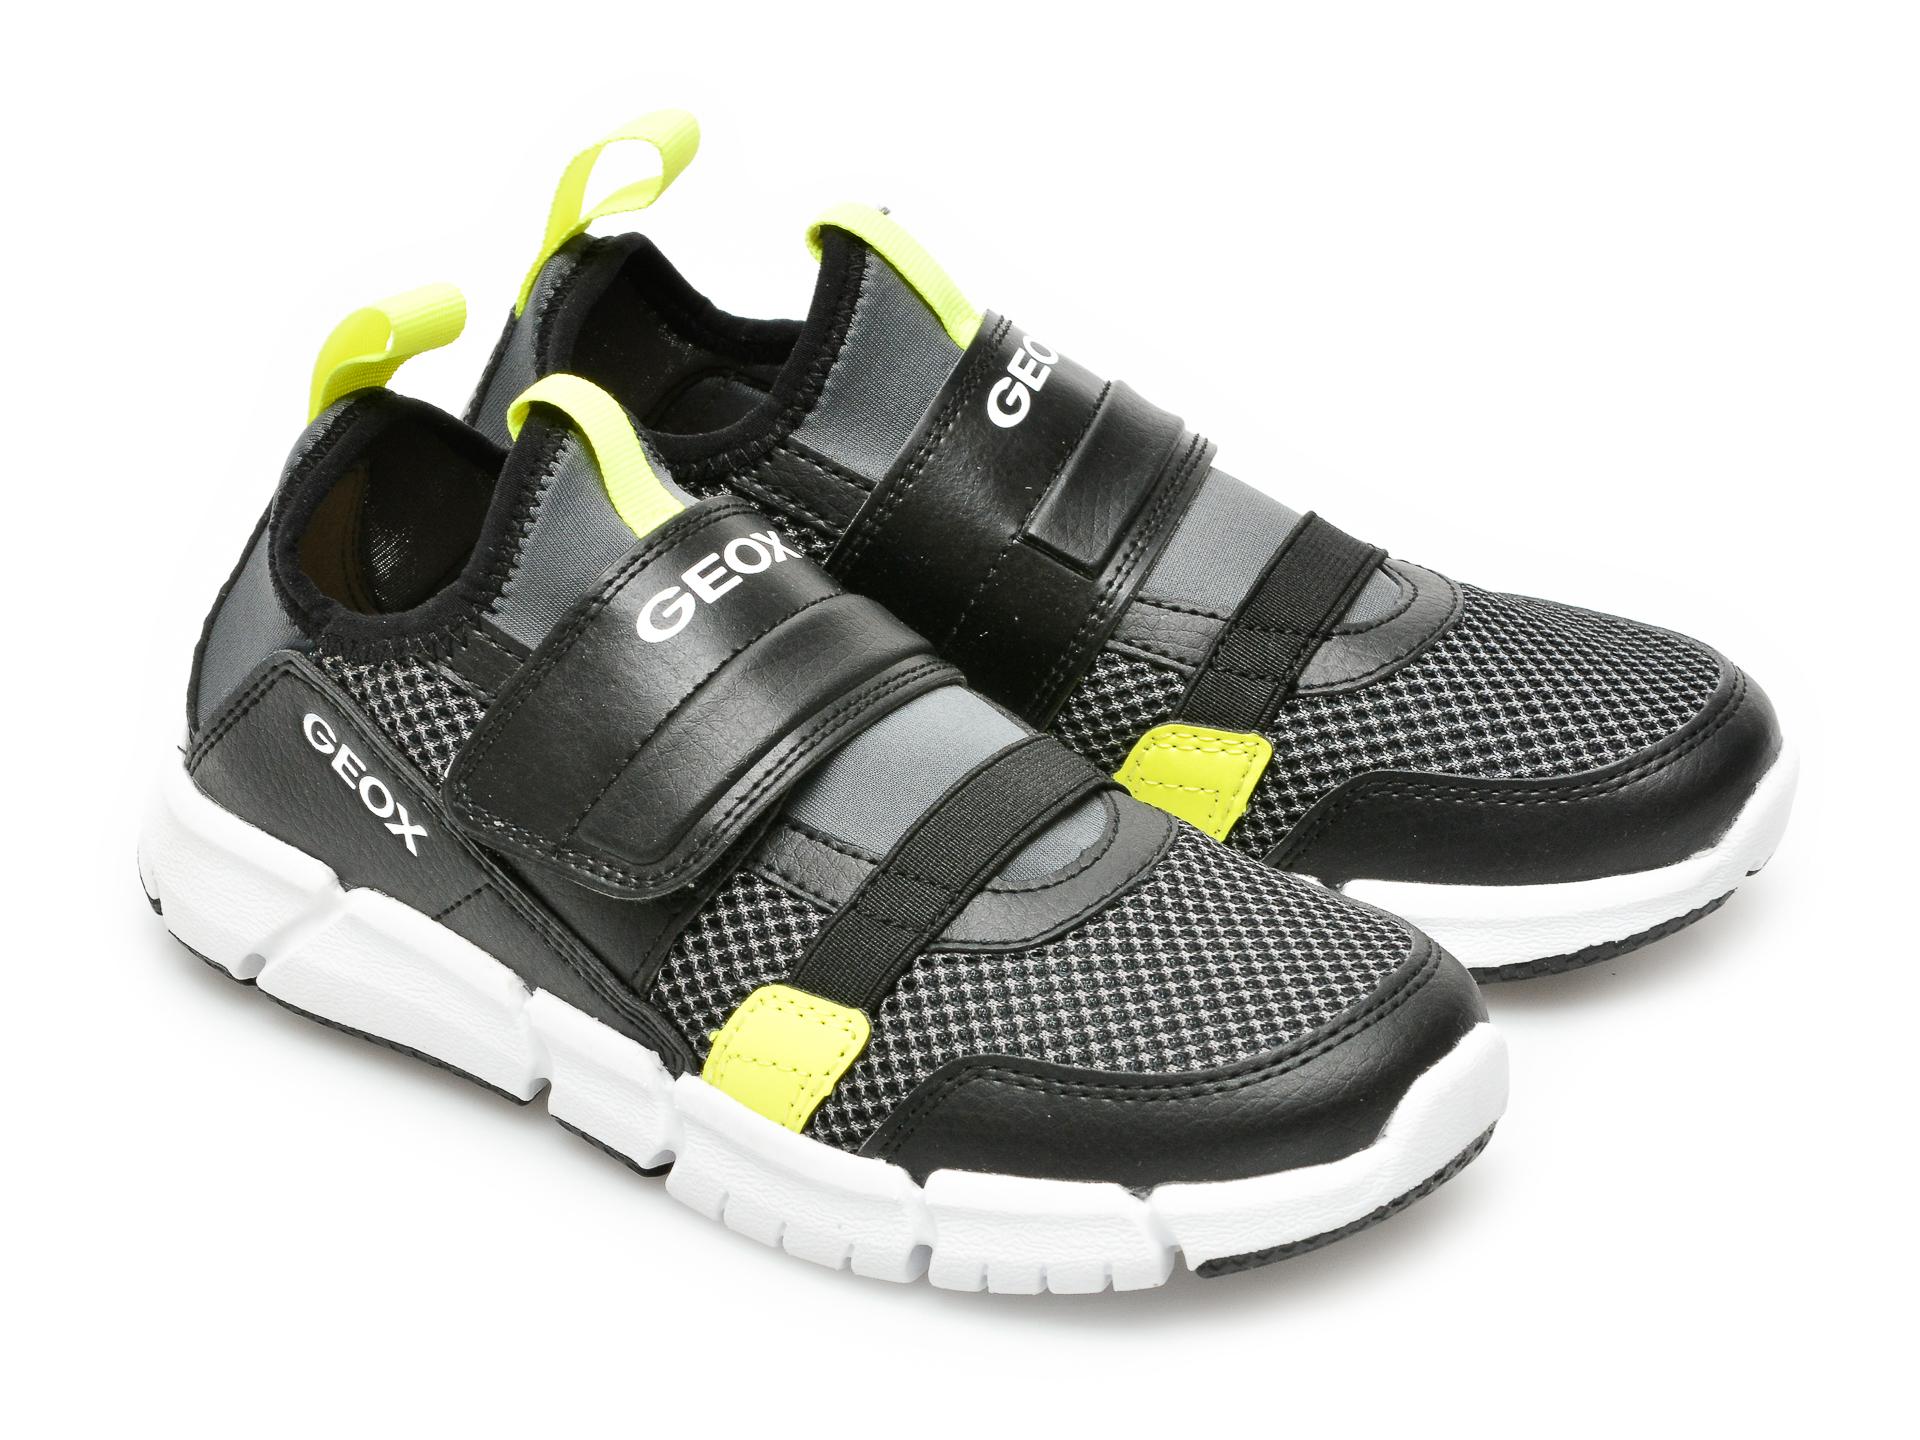 Pantofi sport GEOX negri, J159BC, din material textil si piele ecologica - 4